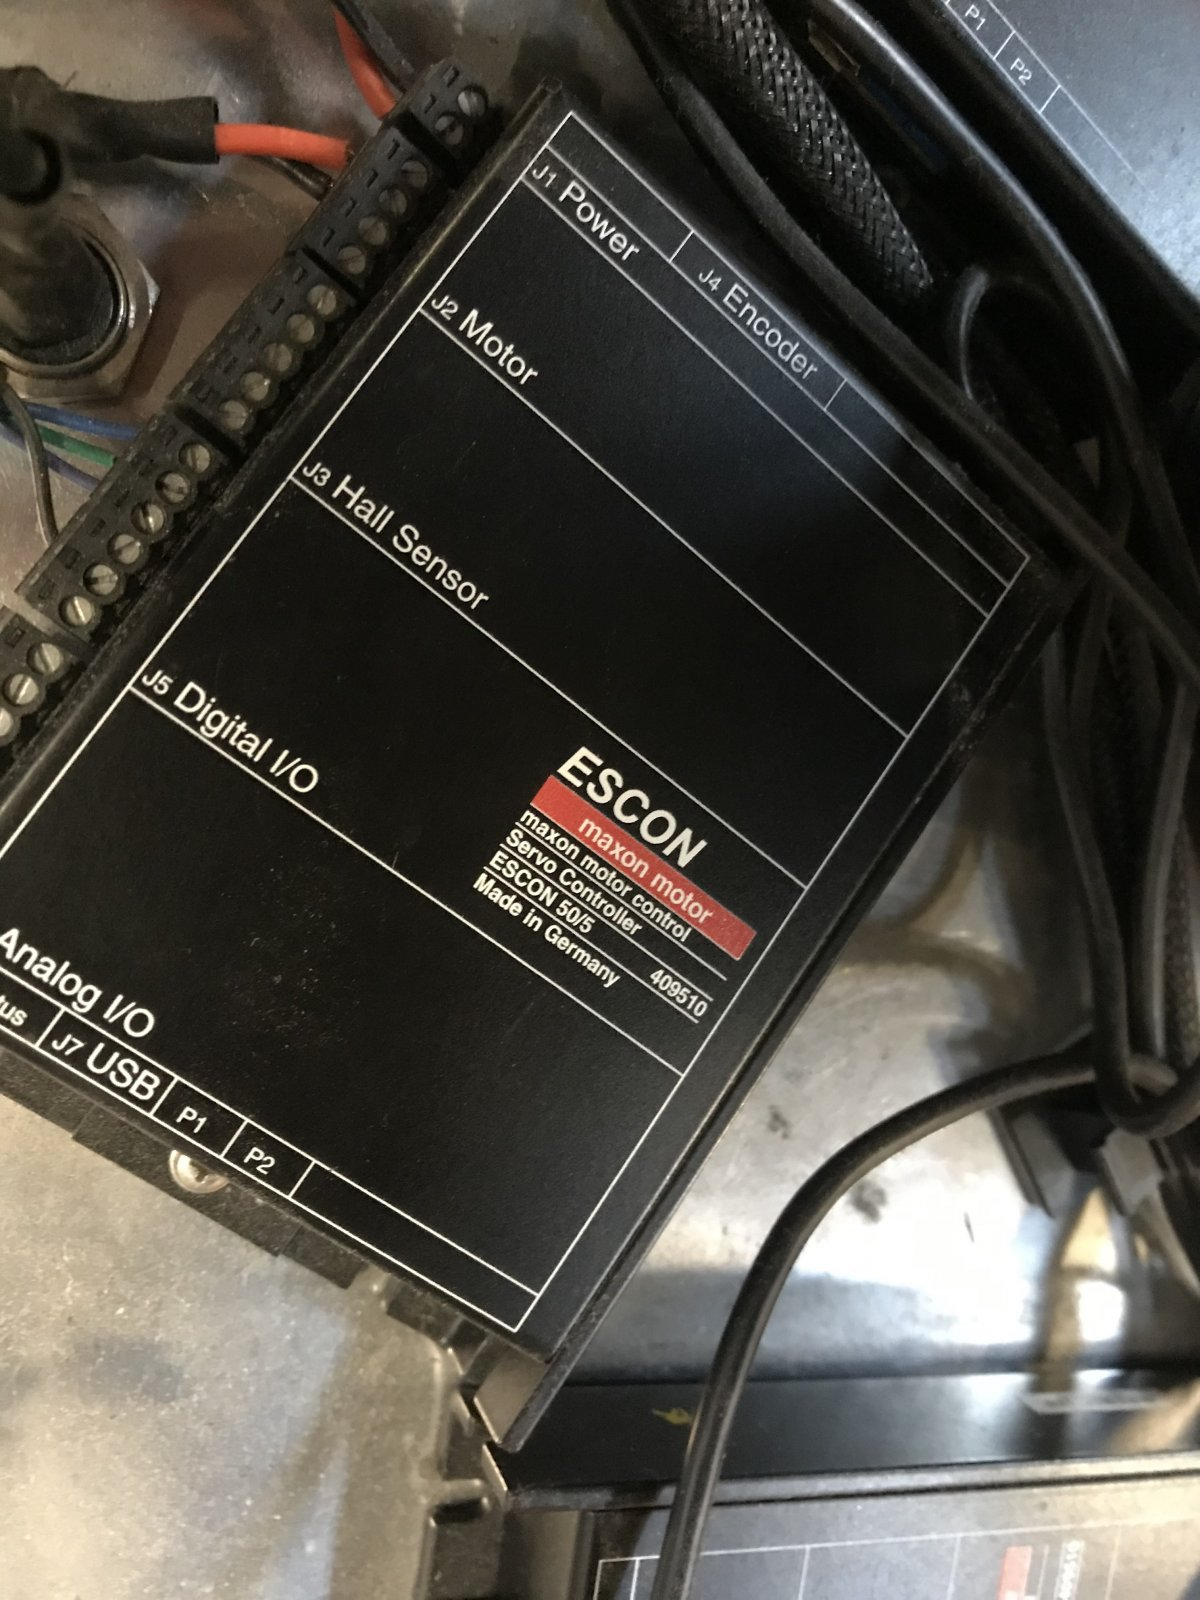 35B6161C-214A-4562-880D-2FC02F4336D5.jpeg